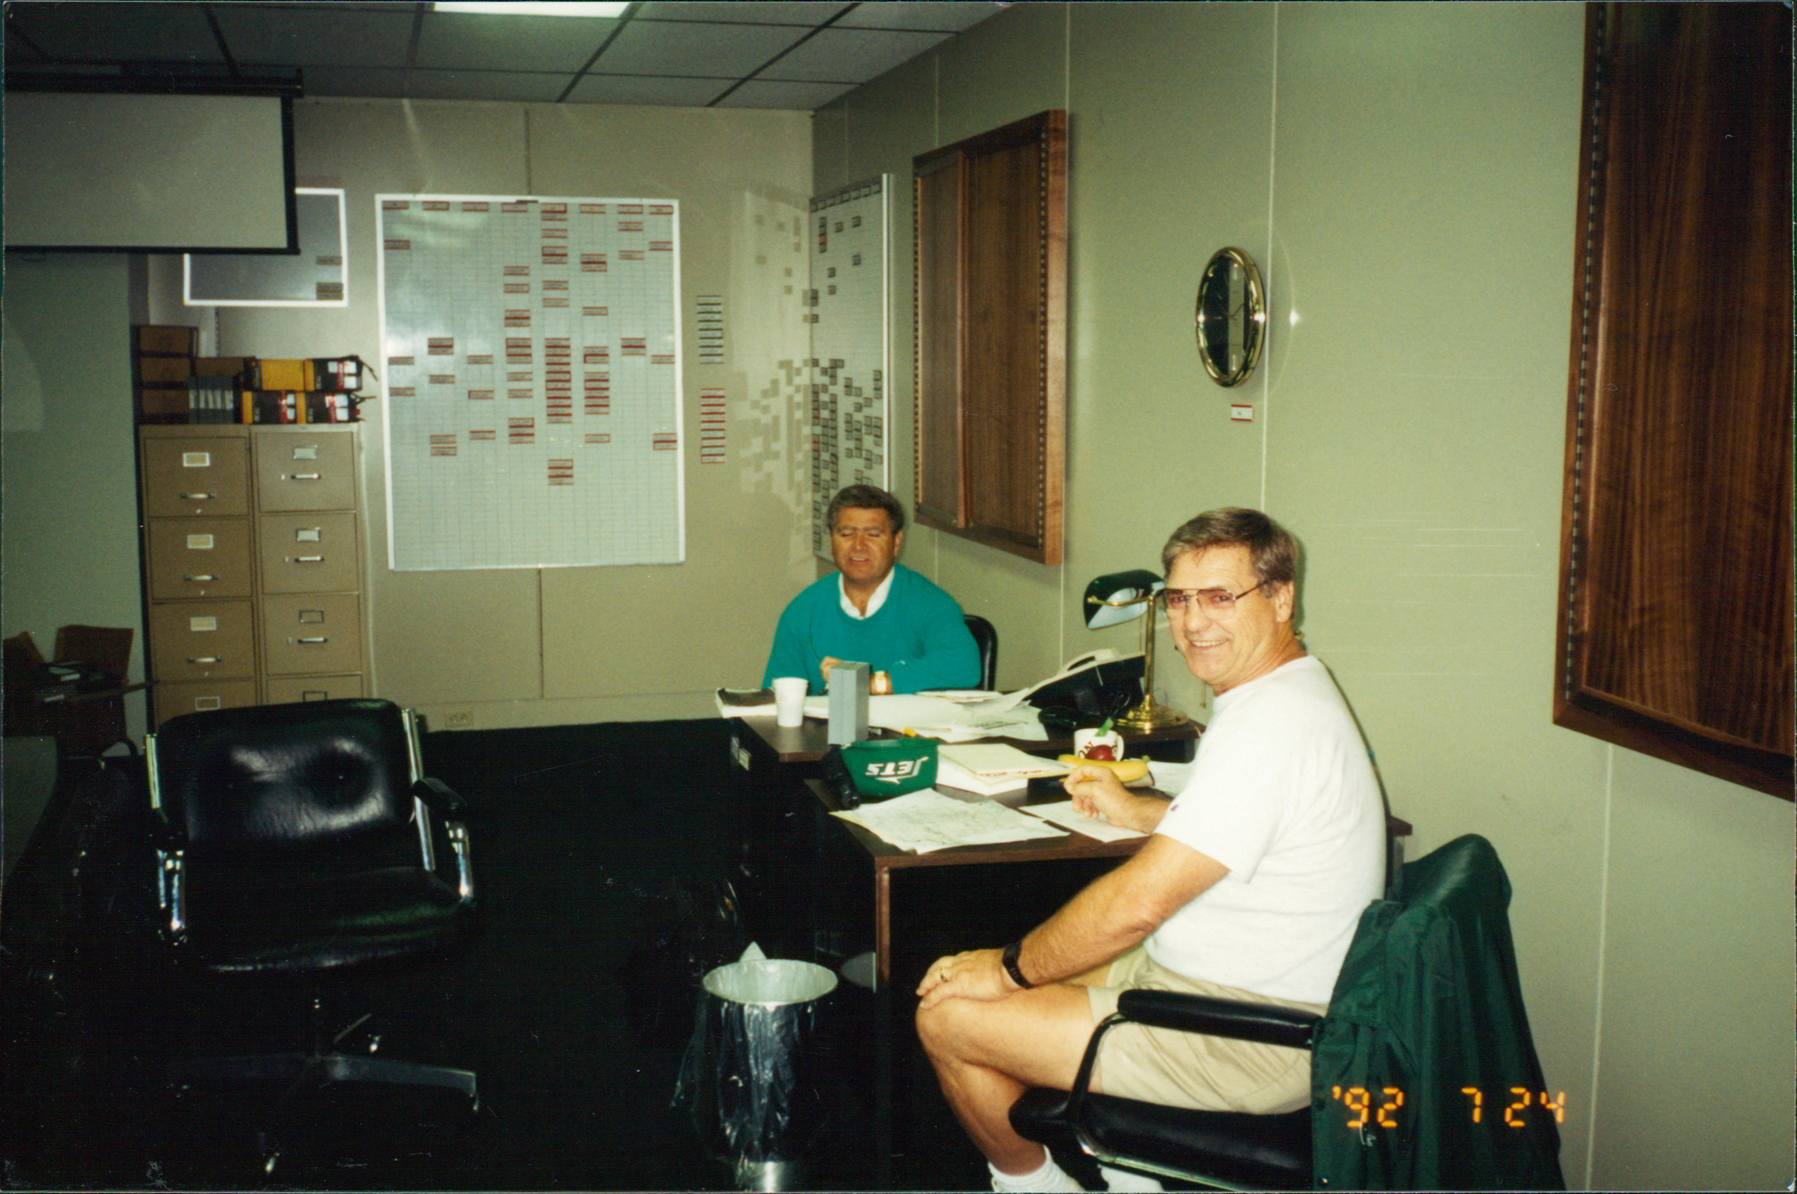 Players Draft Jets 2013